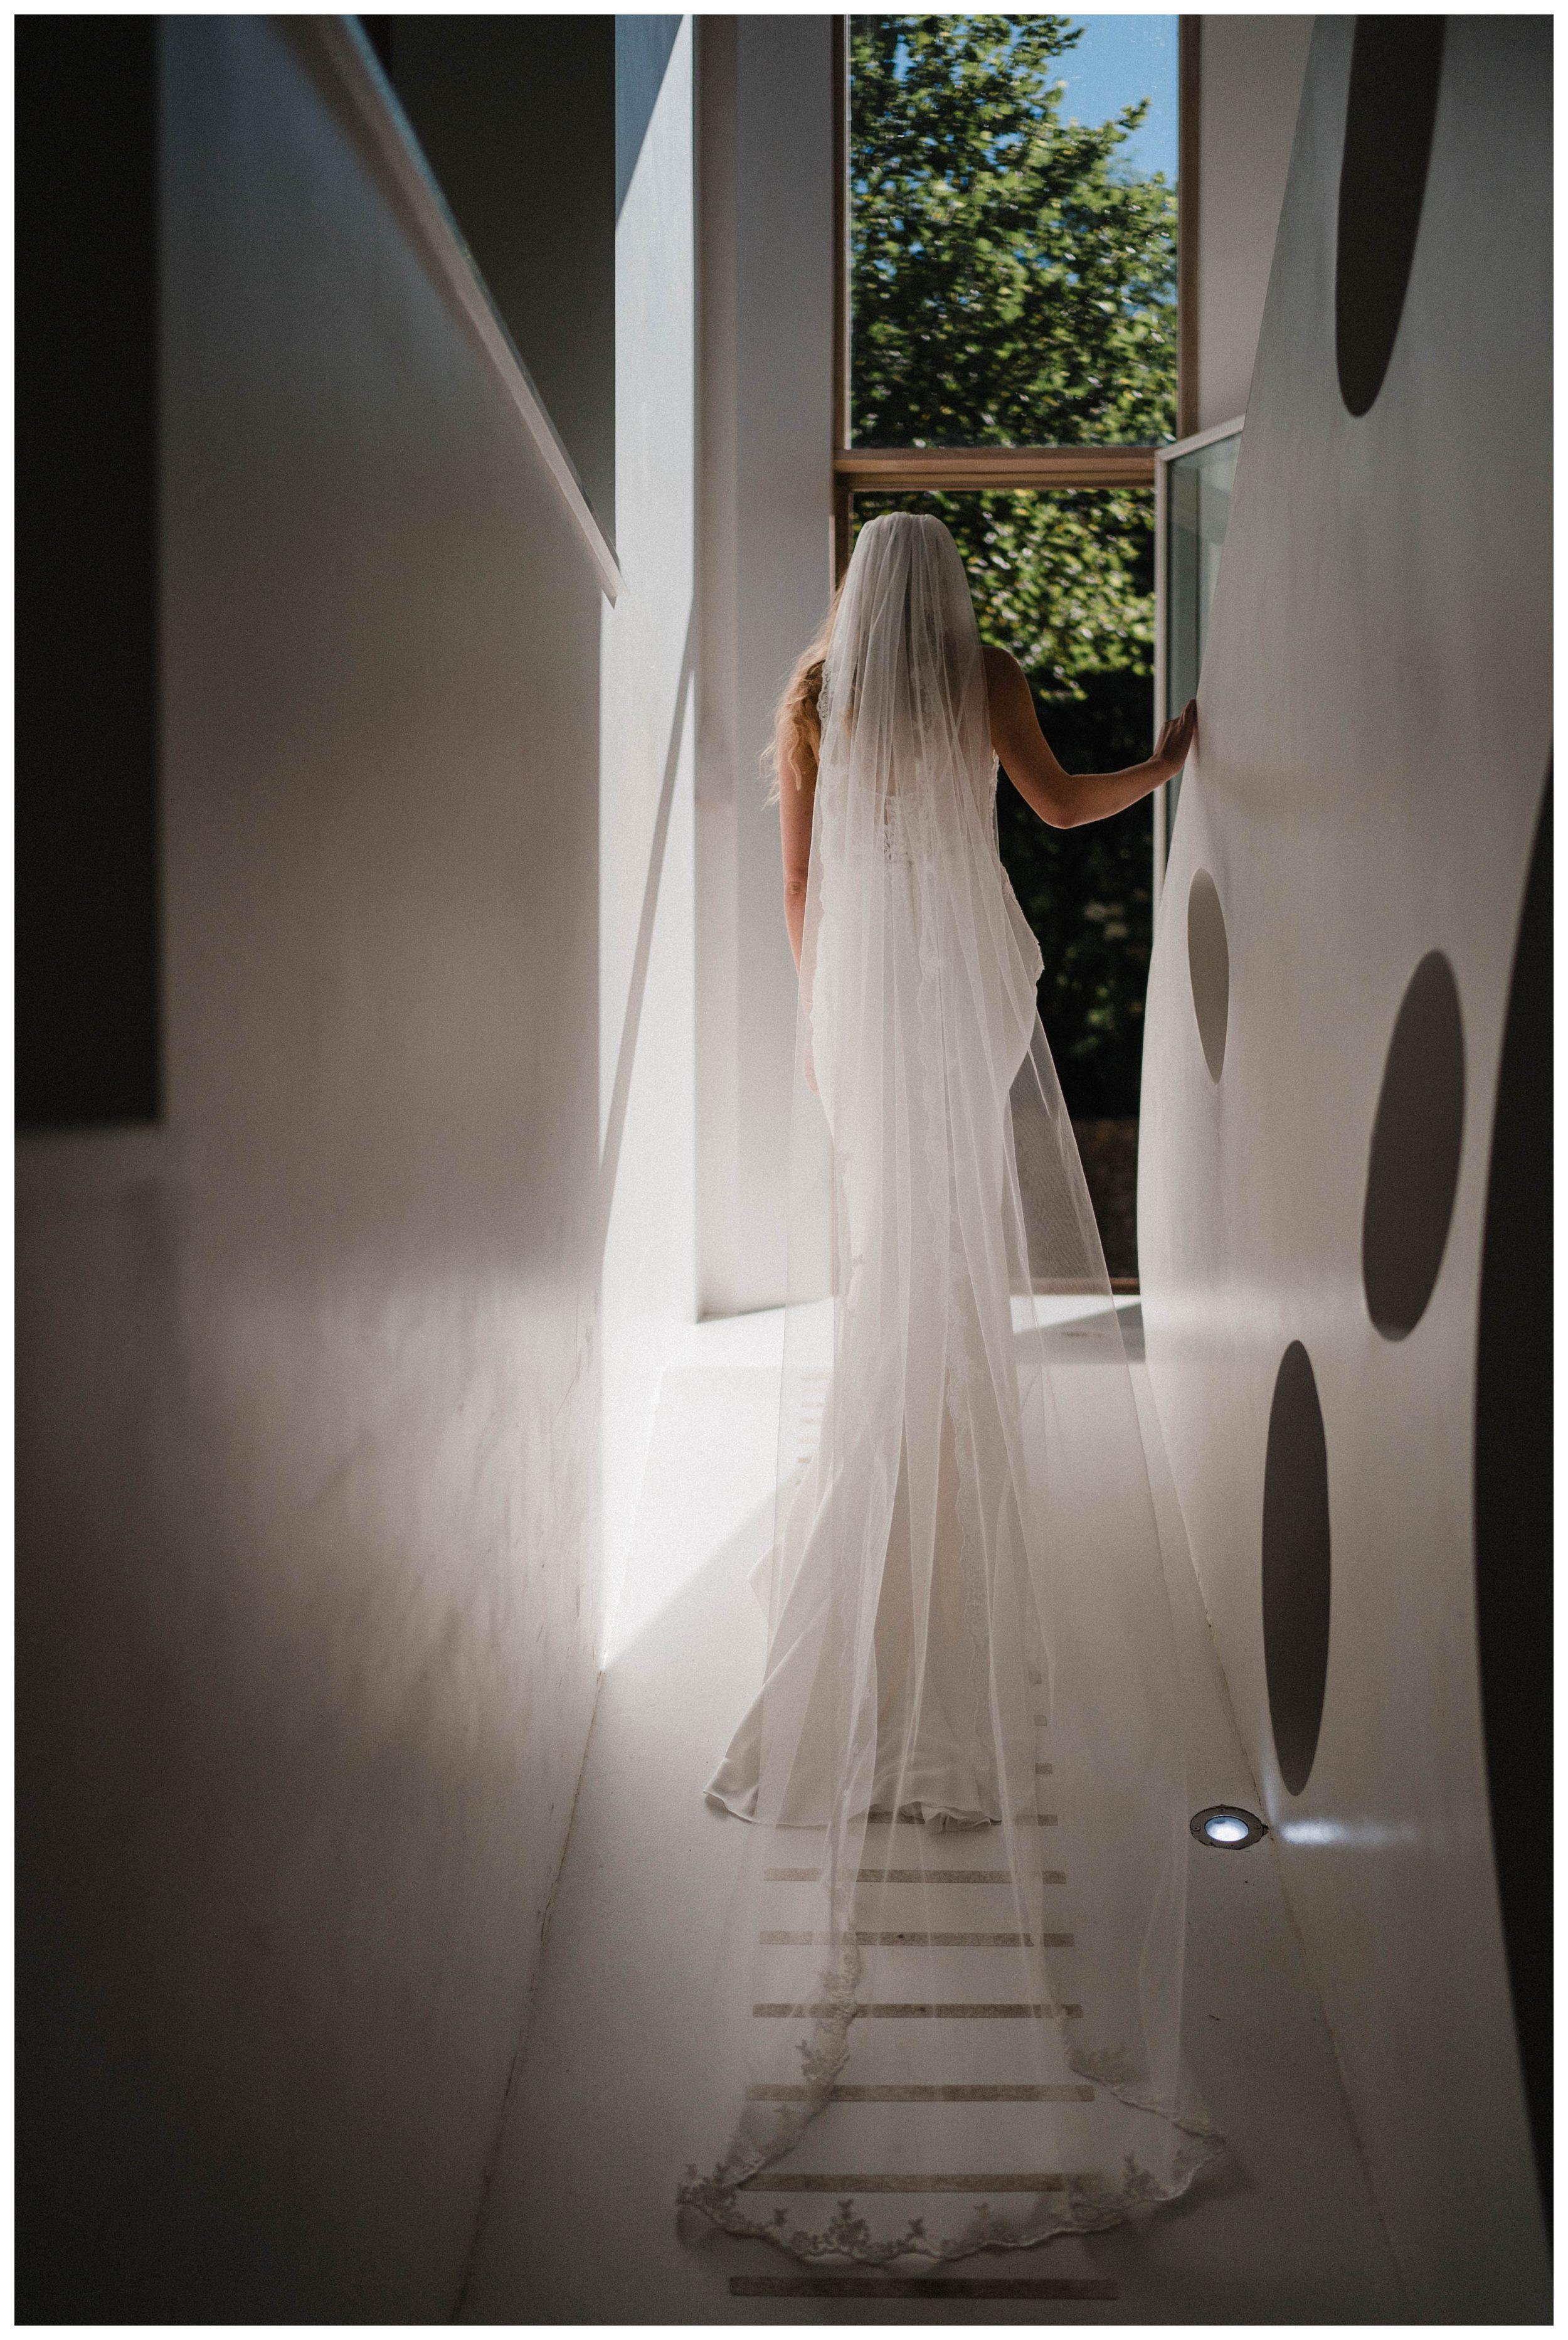 huwelijksfotograaf bruidsfotograaf destinationwedding huwelijksfotografie in ardennen nederland (86).jpg